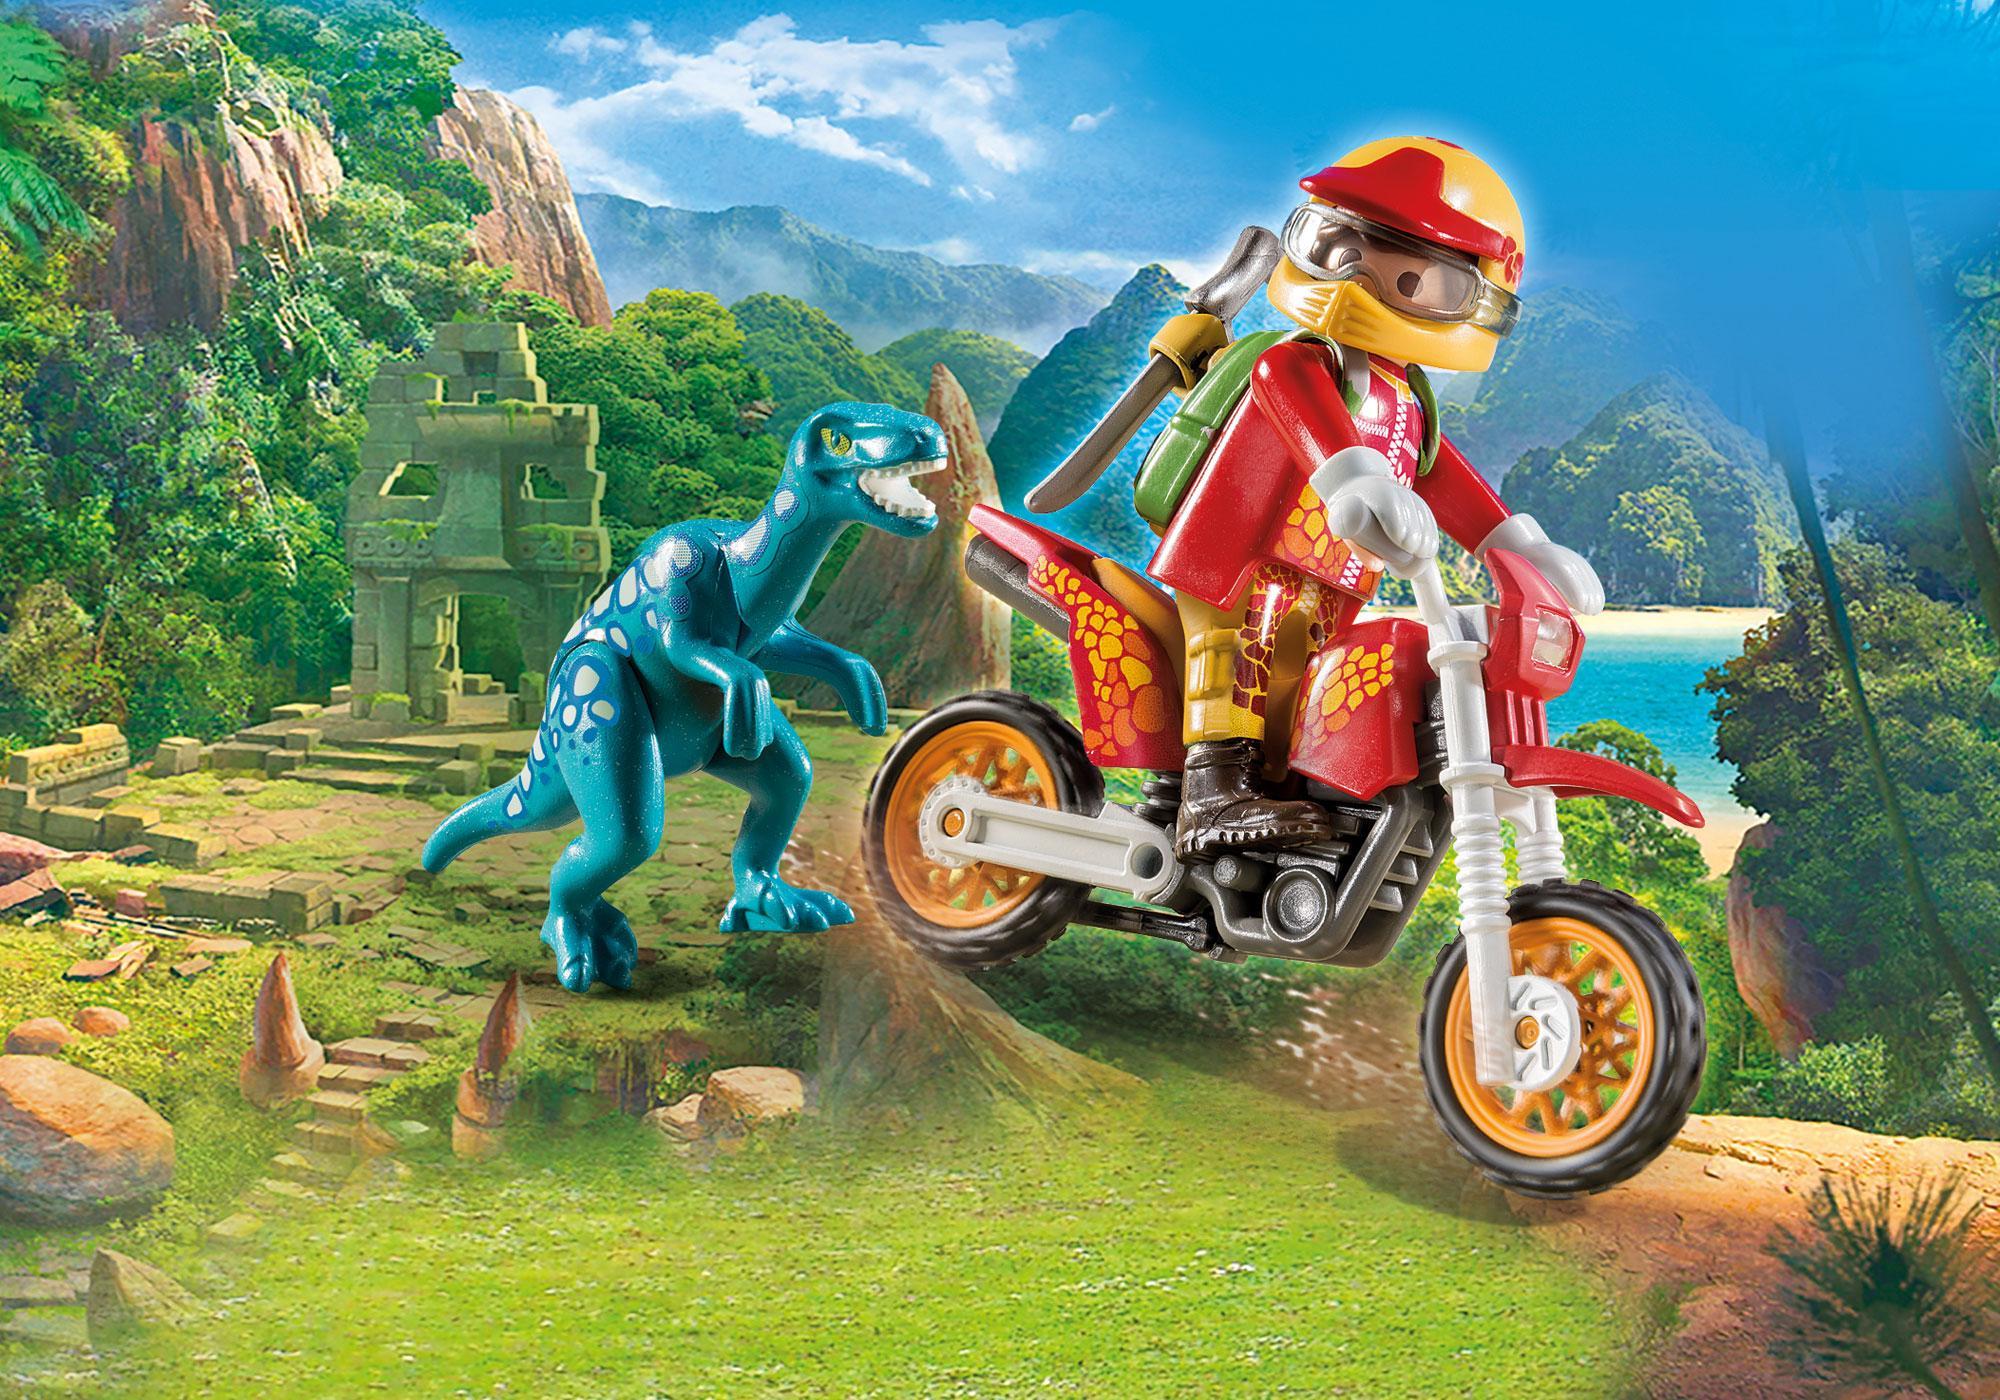 9431_product_detail/Motocross-cykel med Raptor